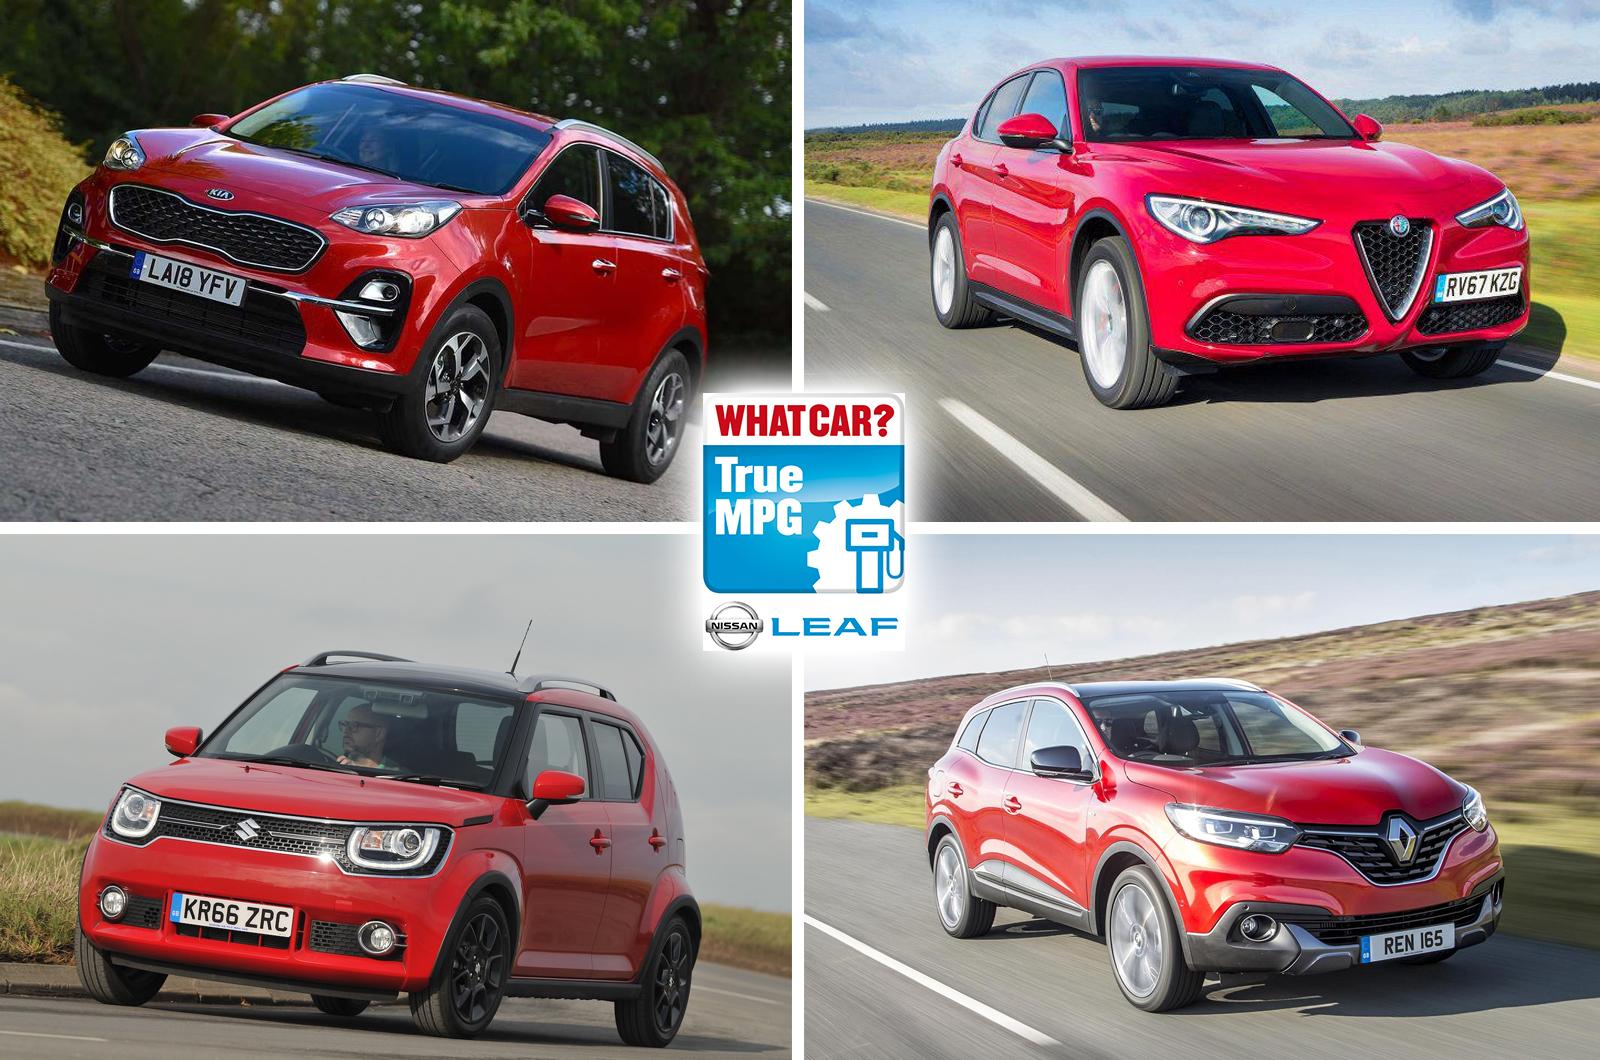 Alfa Romeo Stelvio, Suzuki Ignis, Renault Kadjar, Kia Sportage